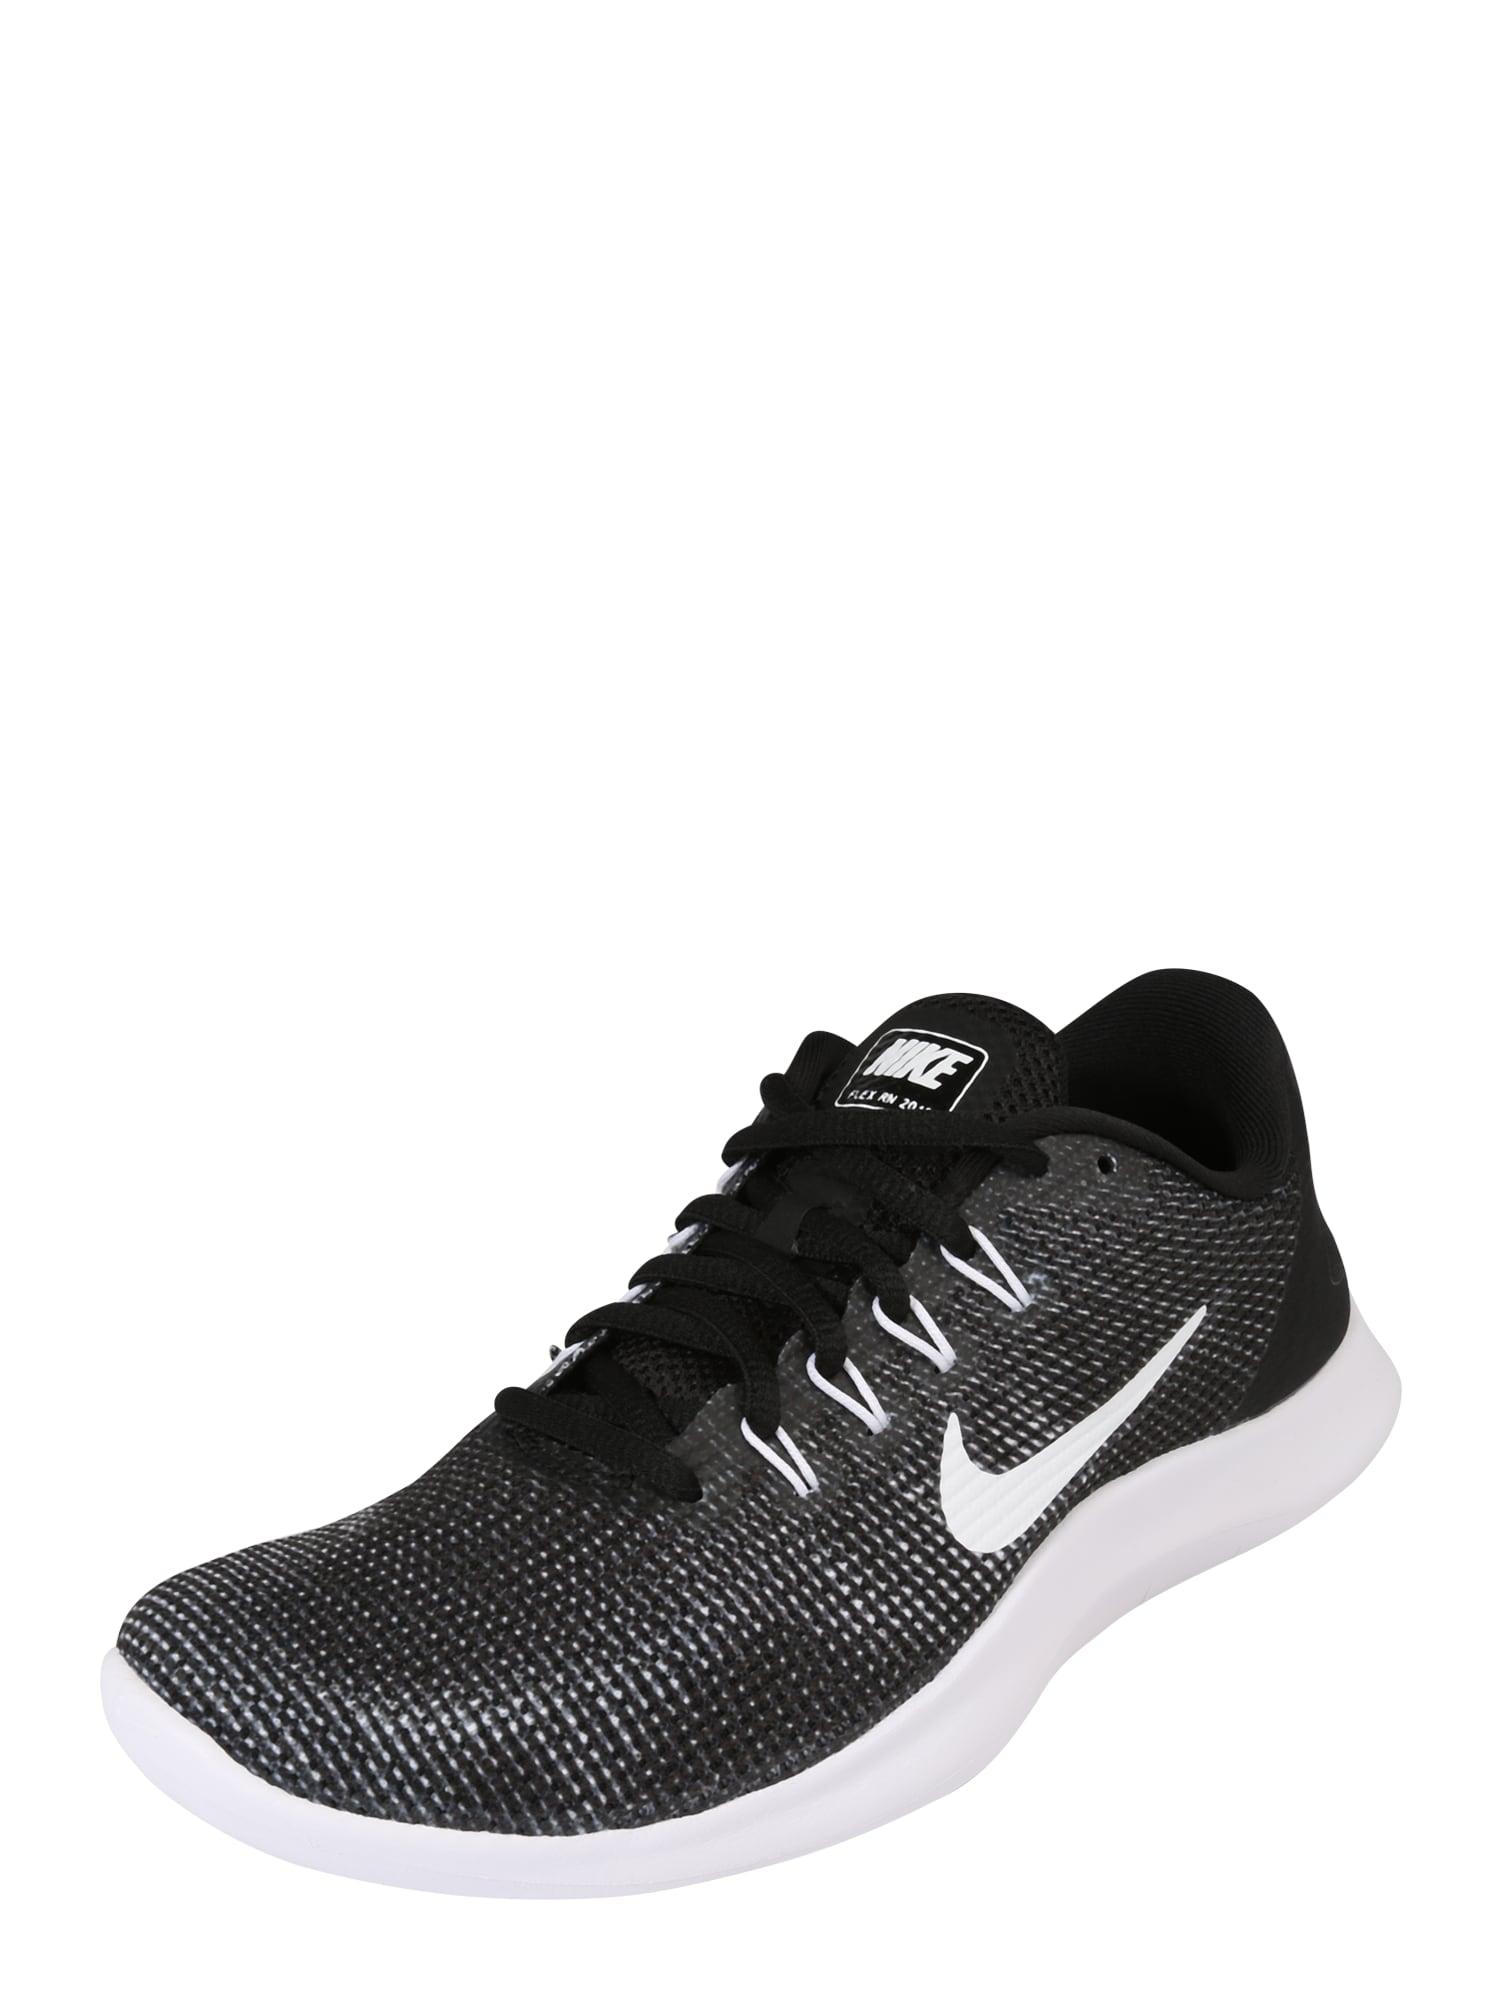 Běžecká obuv Flex RN 2018 světle šedá černá bílá NIKE